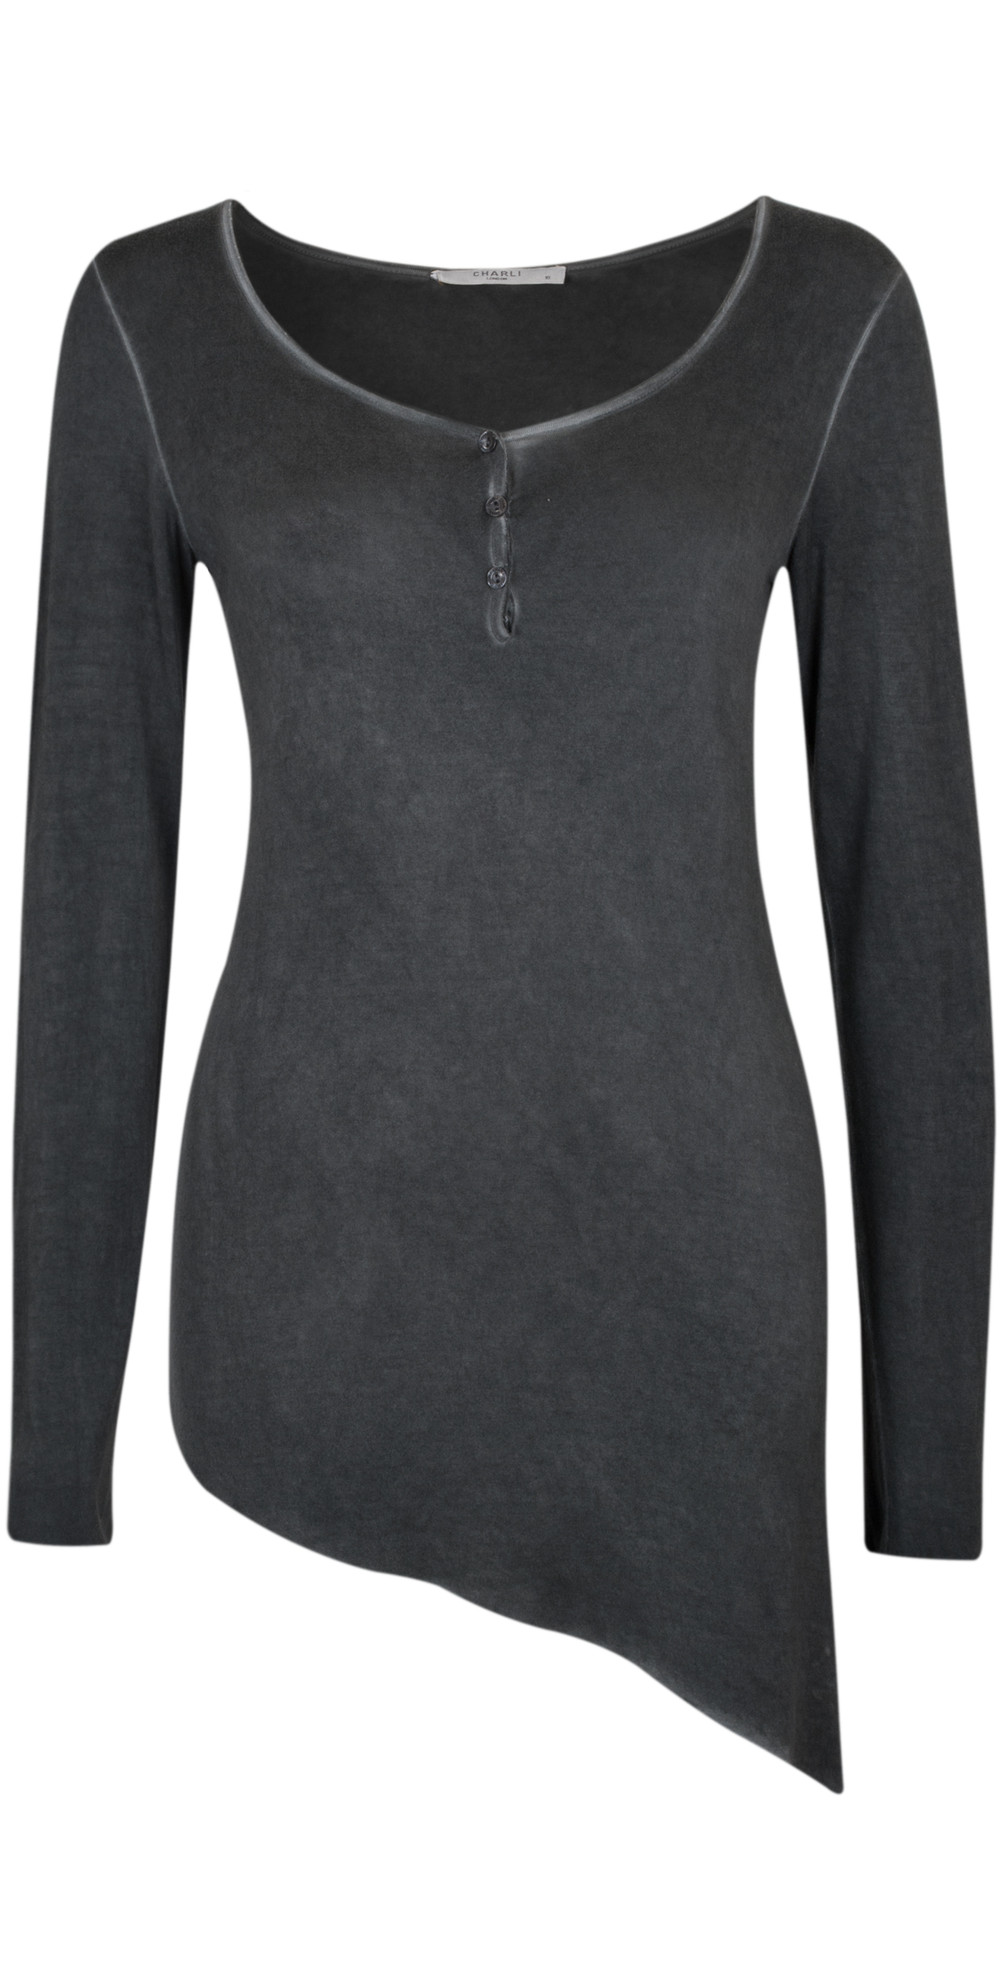 Charli clothing online